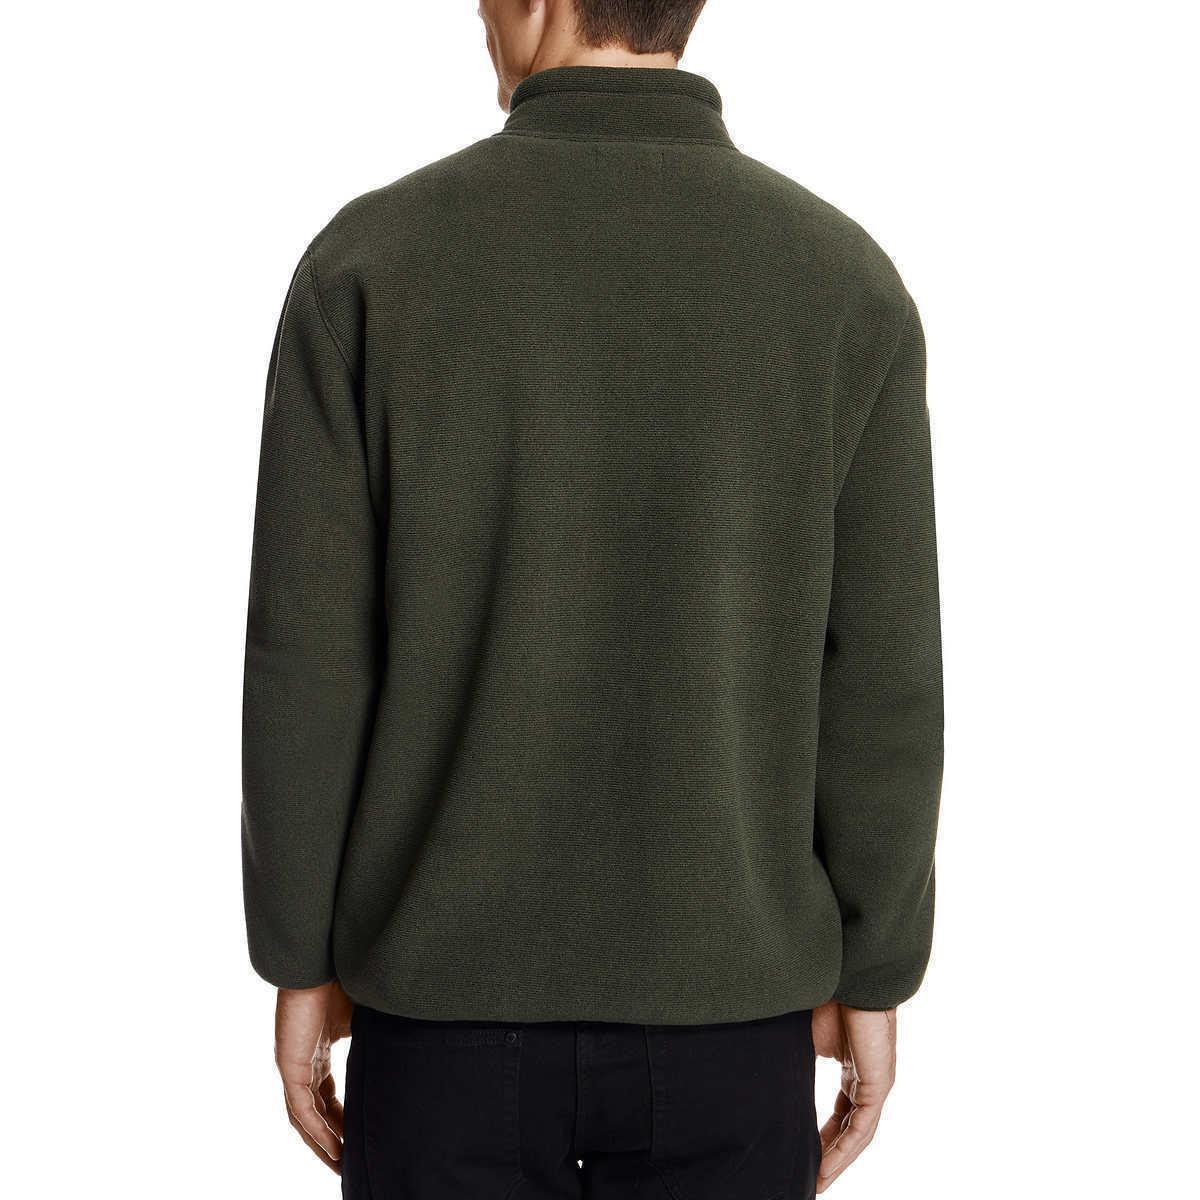 SALE! 32 Degrees Soft Sherpa Fleece Jacket Zip Chest-Pocket